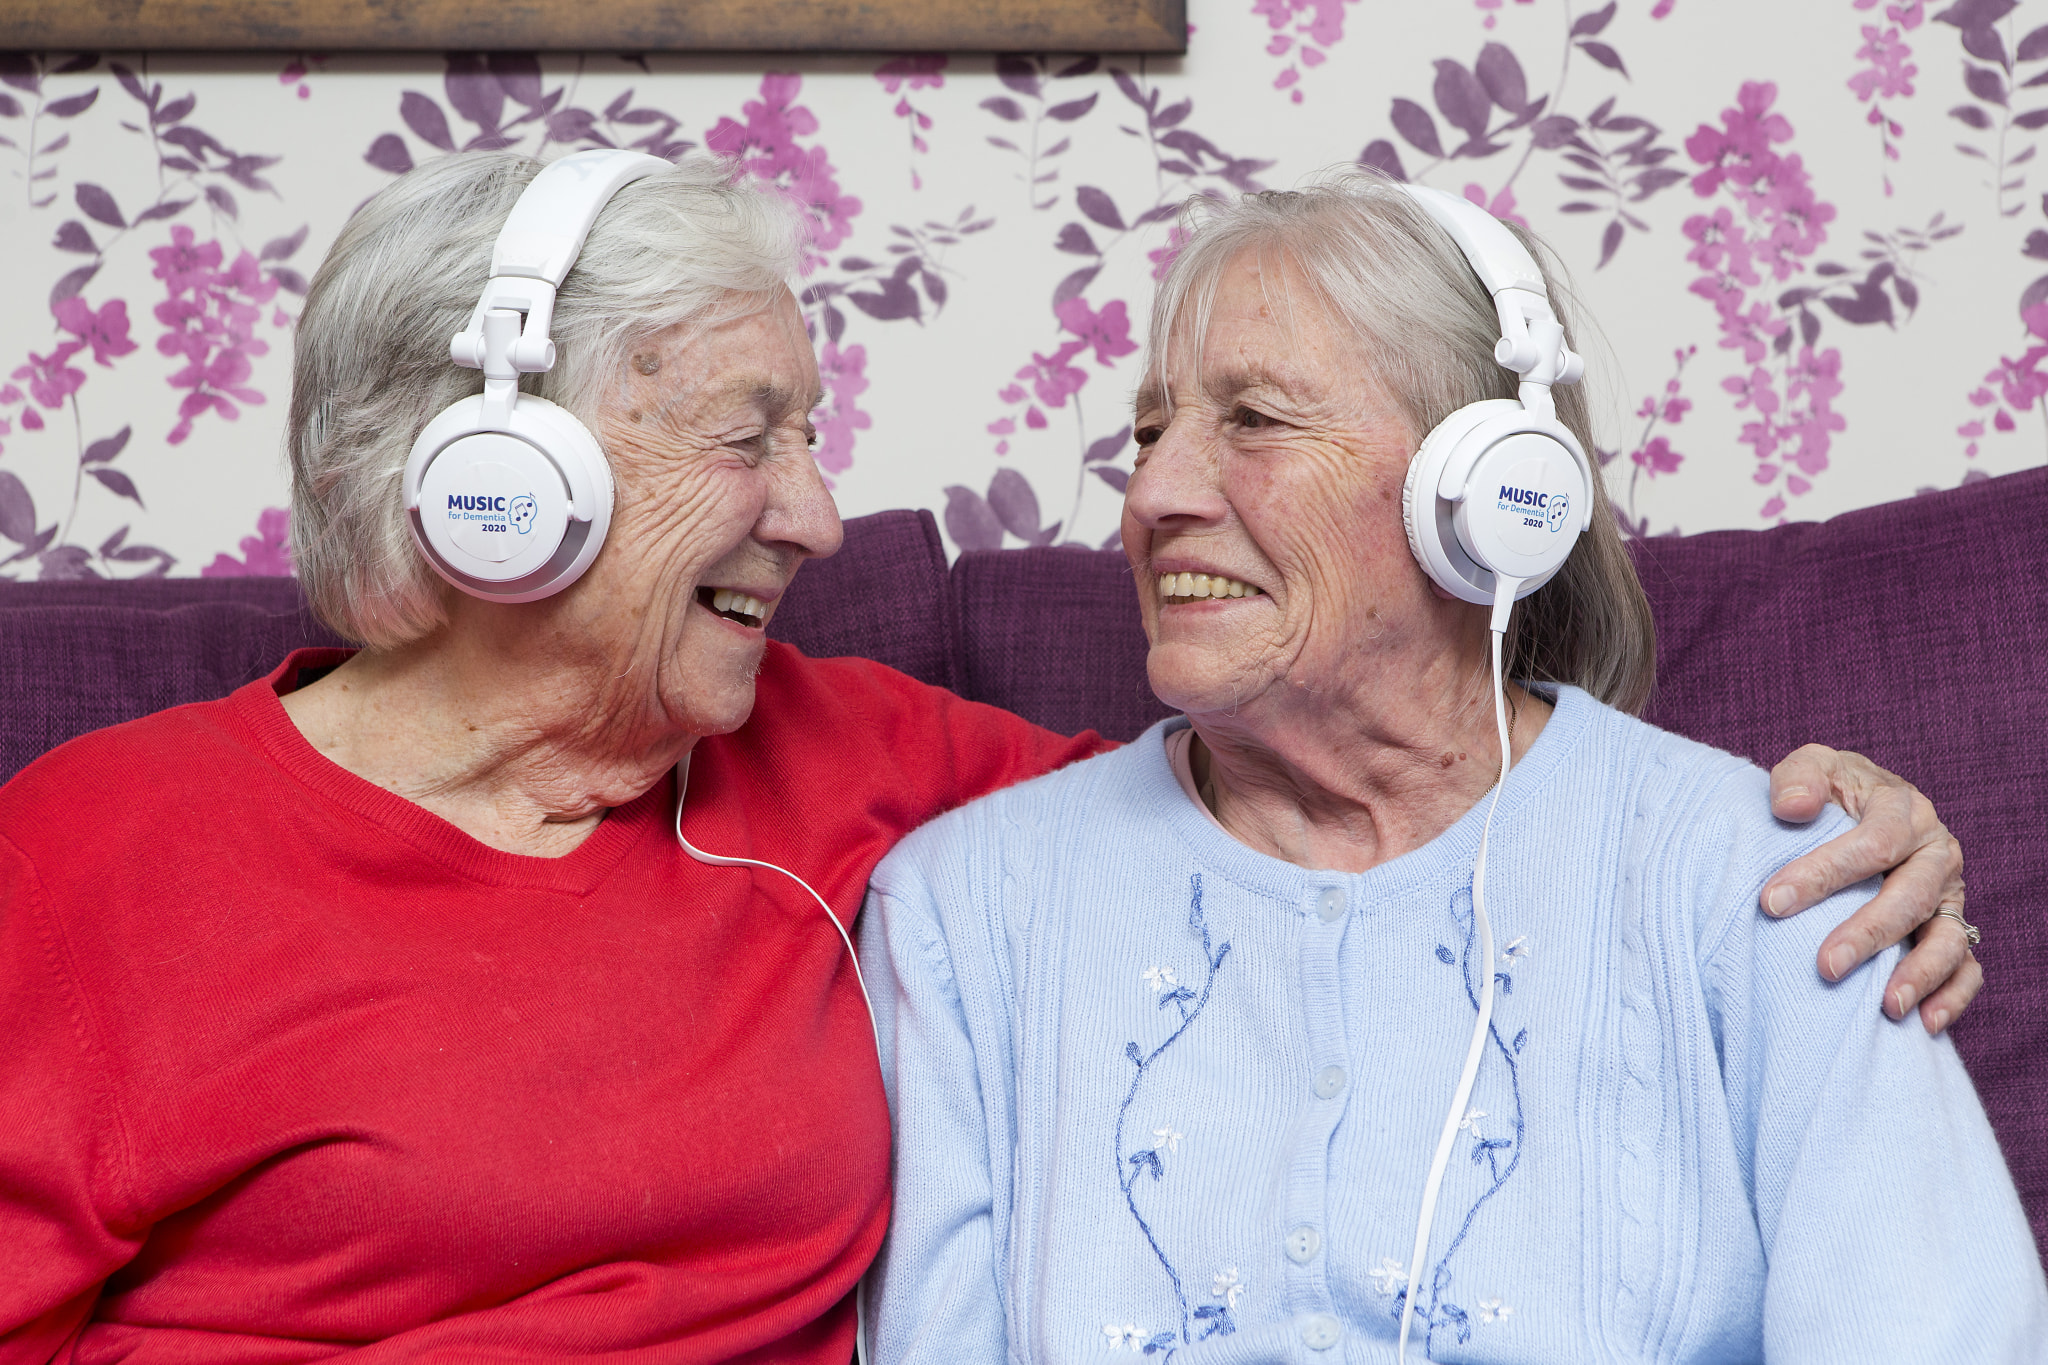 Music for Dementia SB_12